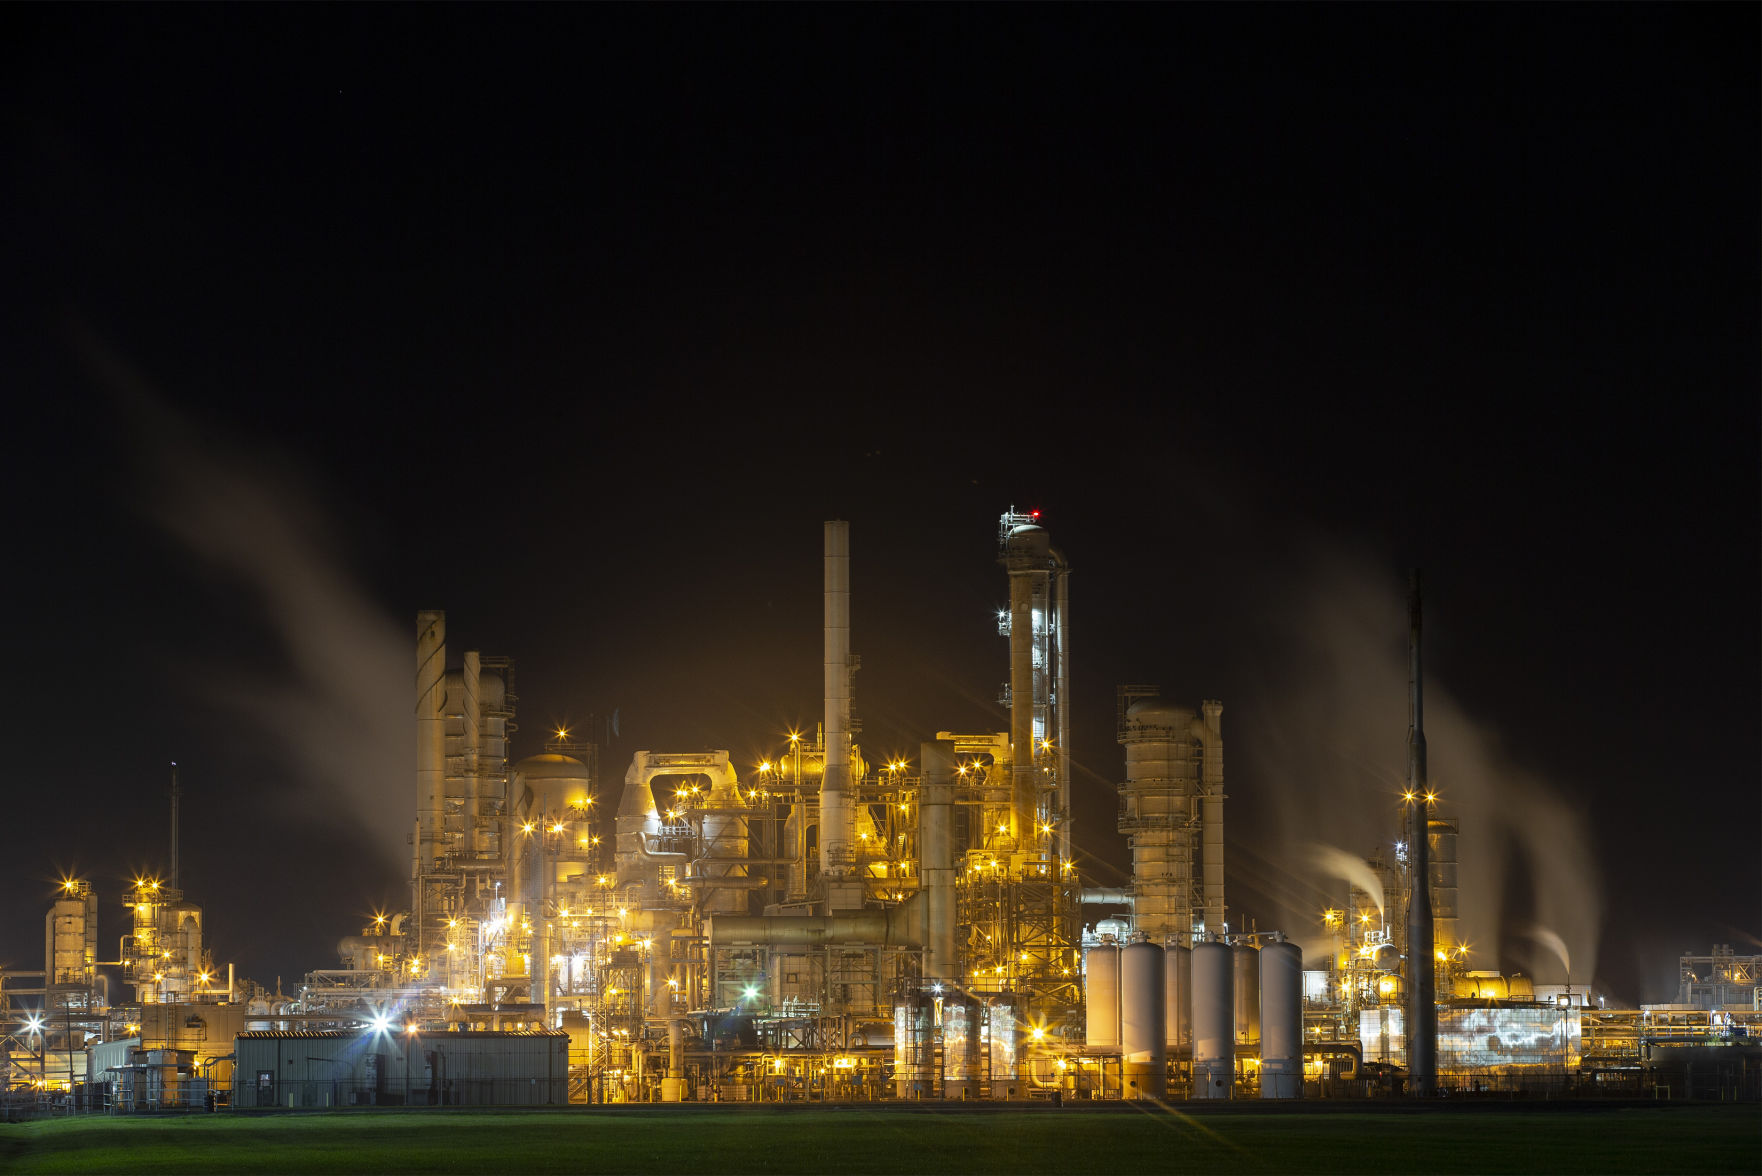 nola.com - NOLA.com staff report - 'Polluter's Paradise' series, with ProPublica, wins top national environmental journalism award